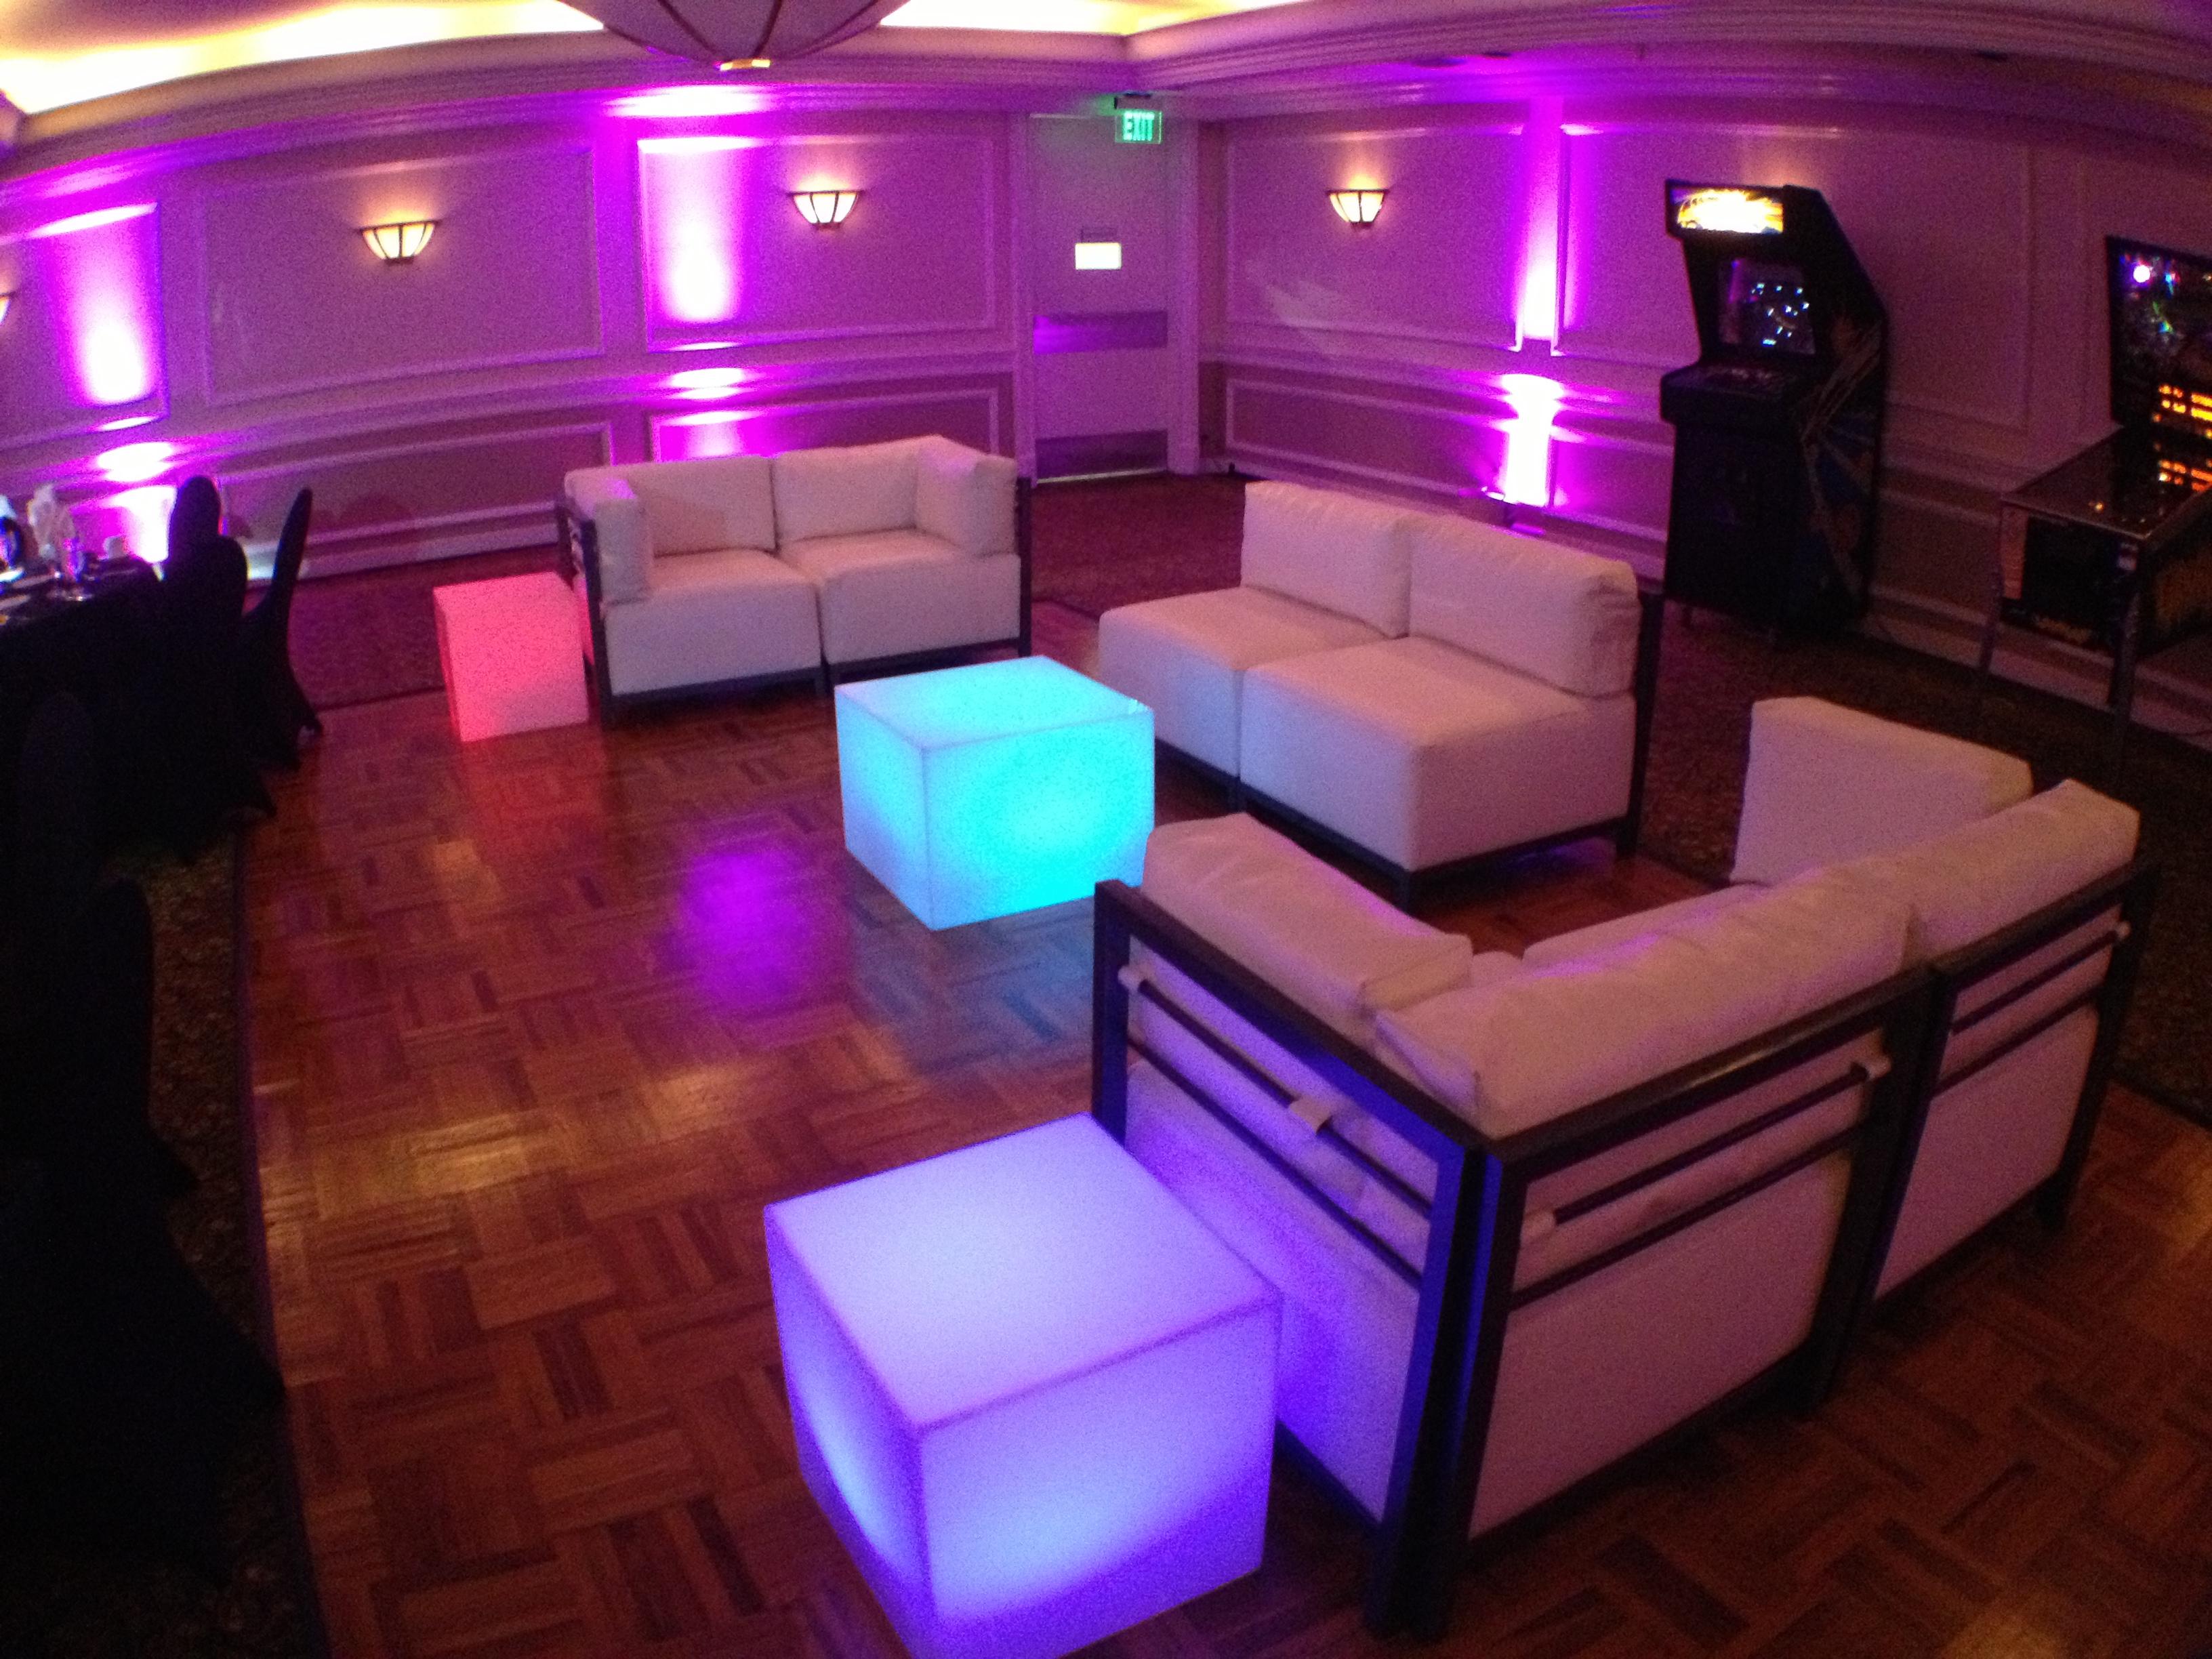 80's theme lounge & arcade